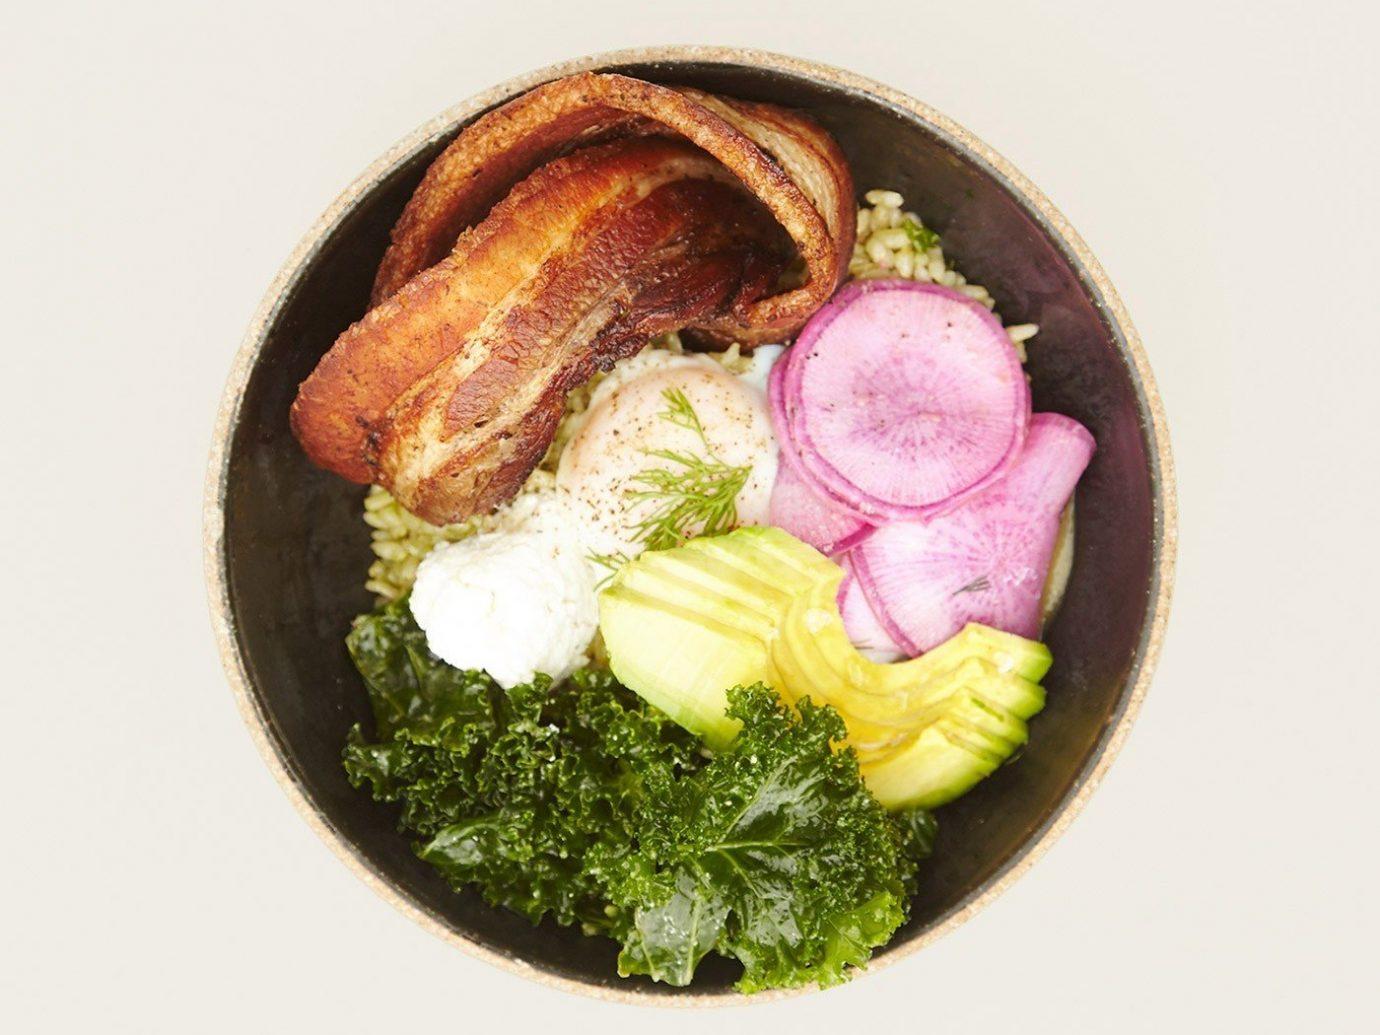 Food + Drink dish food meal cuisine produce dishware breakfast vegetable